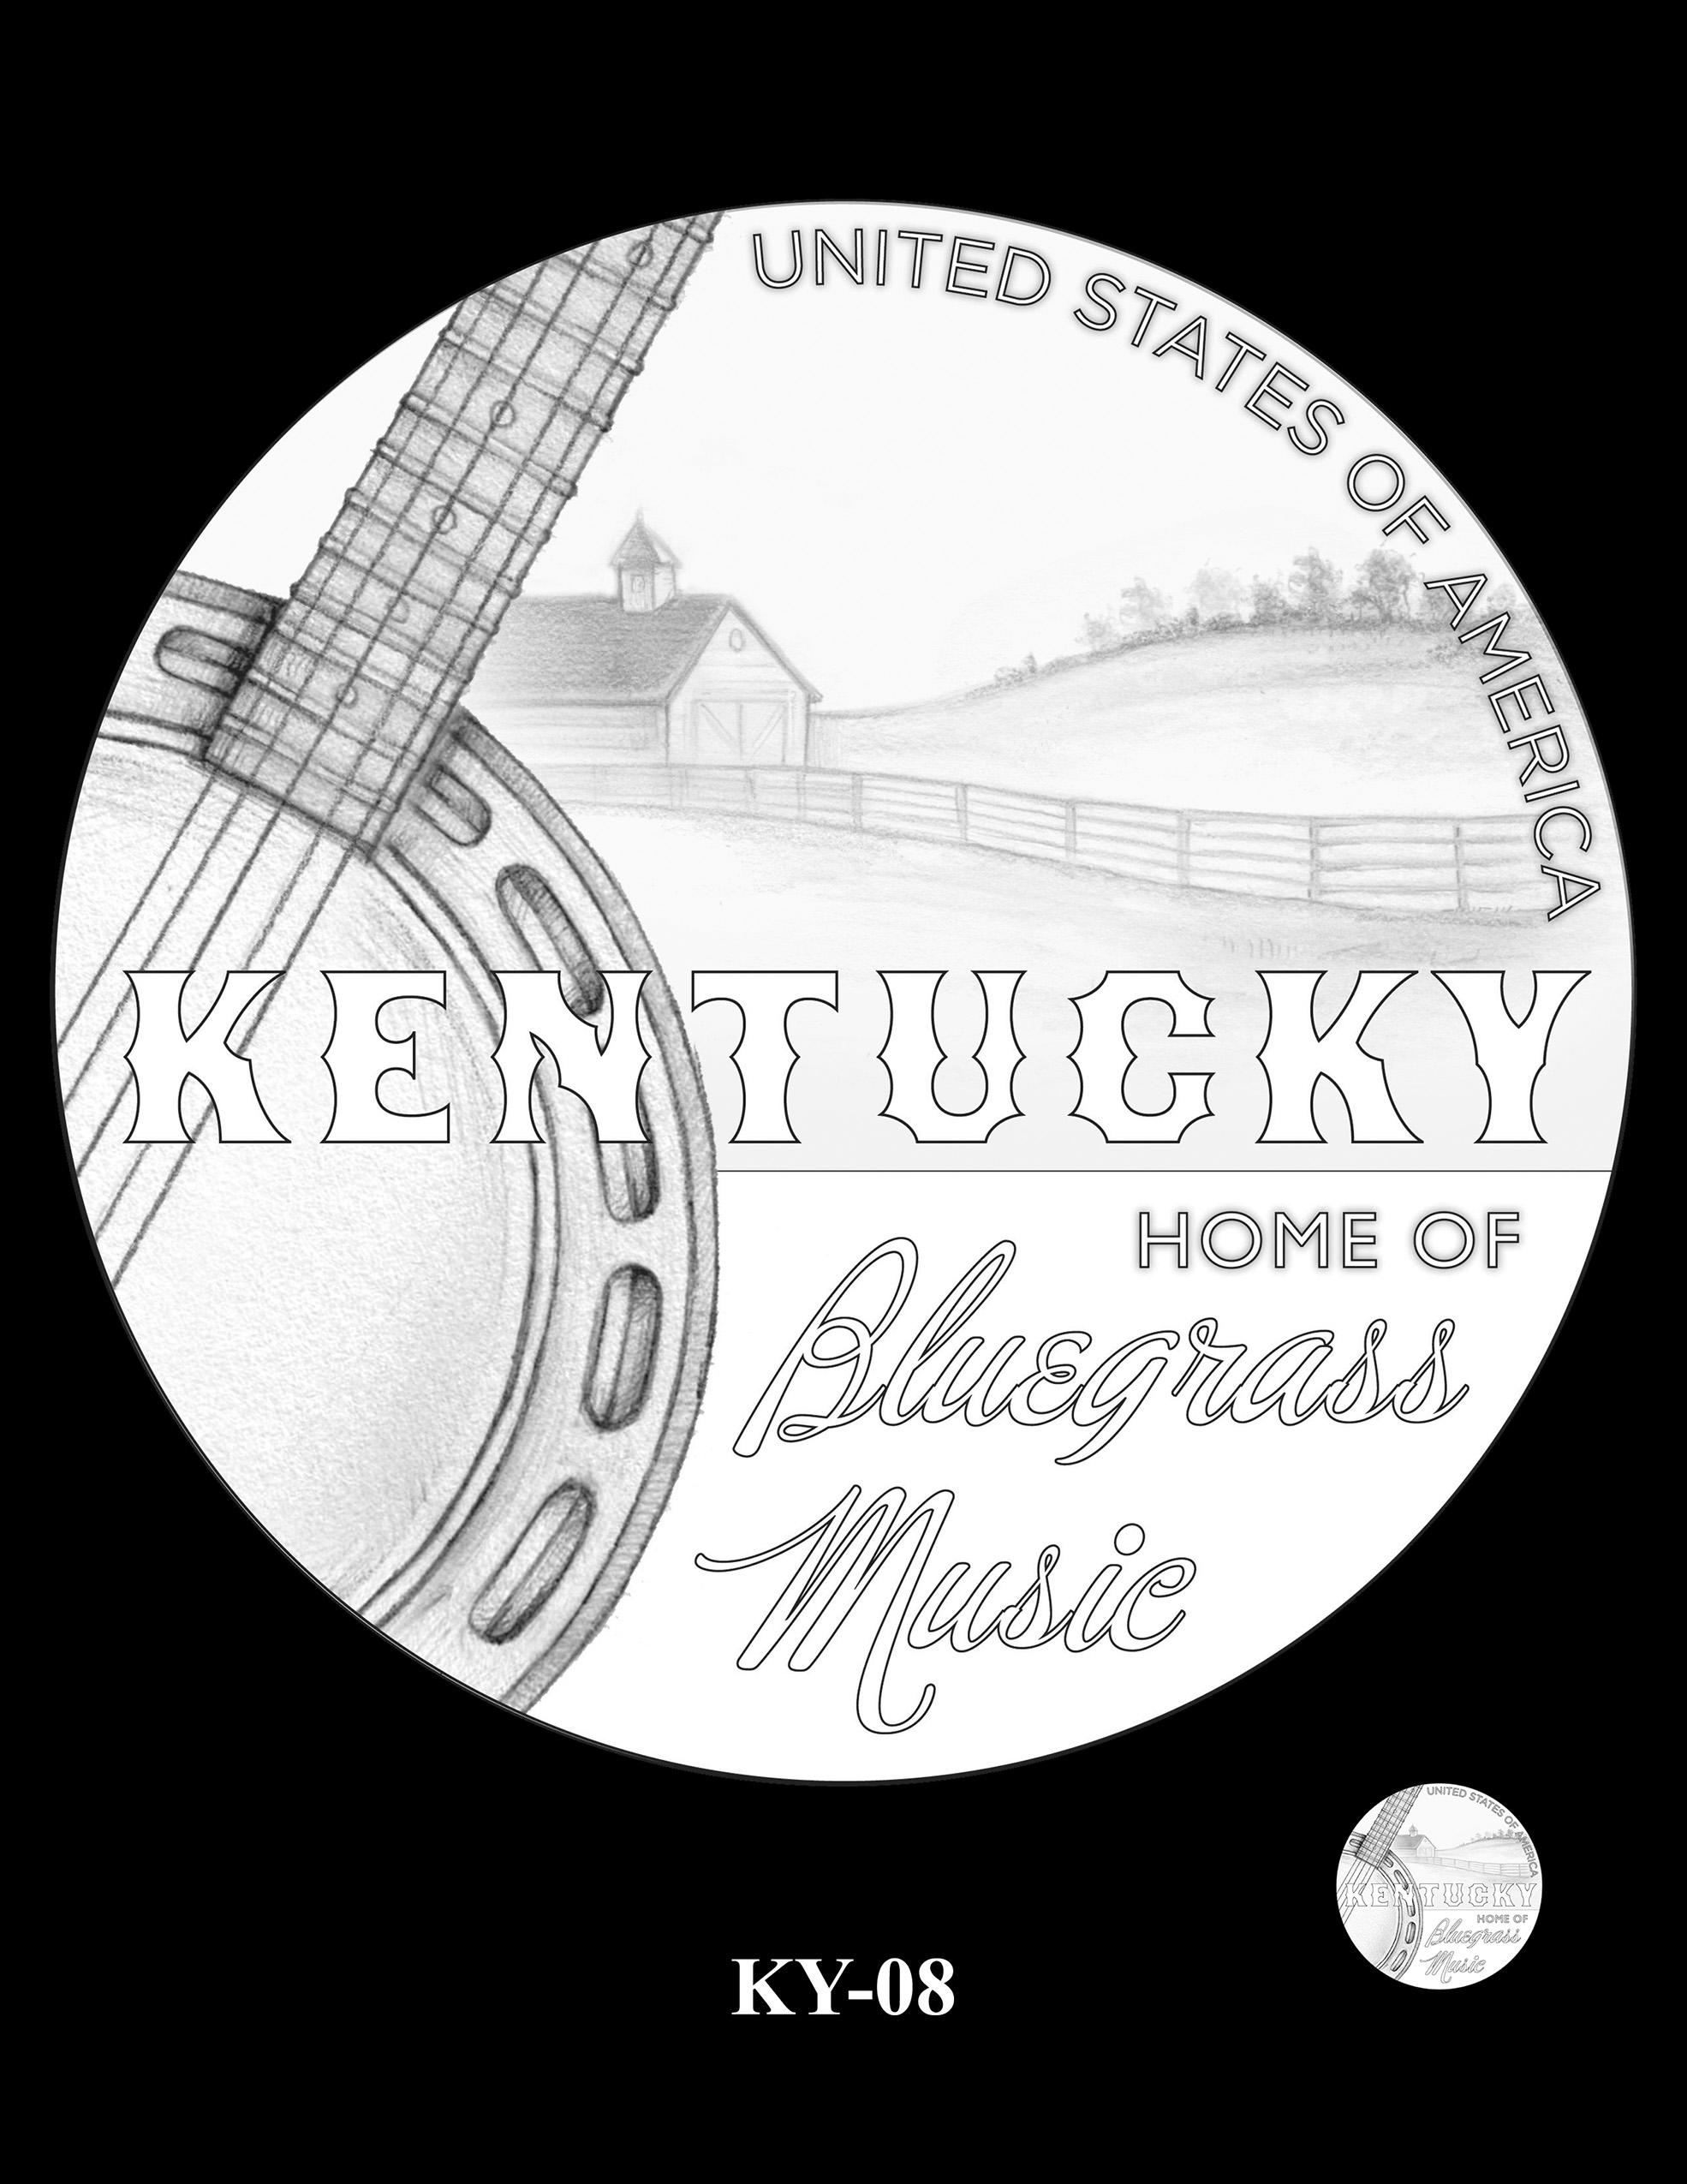 KY-08 -- 2022 American Innovation $1 Coin - Kentucky